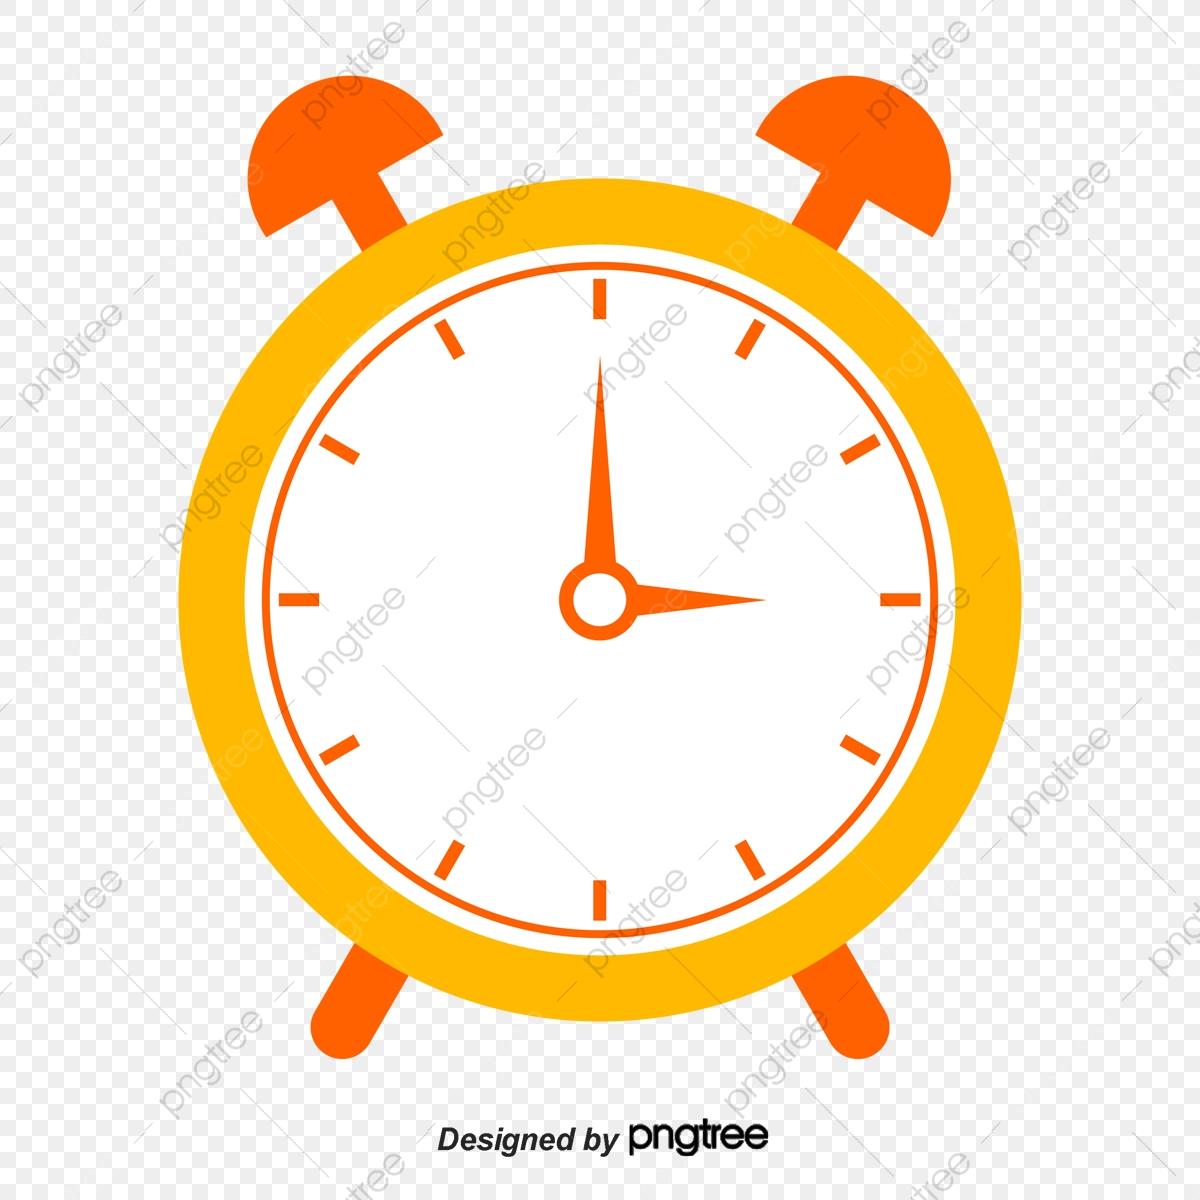 Cartoon alarm clock png. Clocks clipart yellow